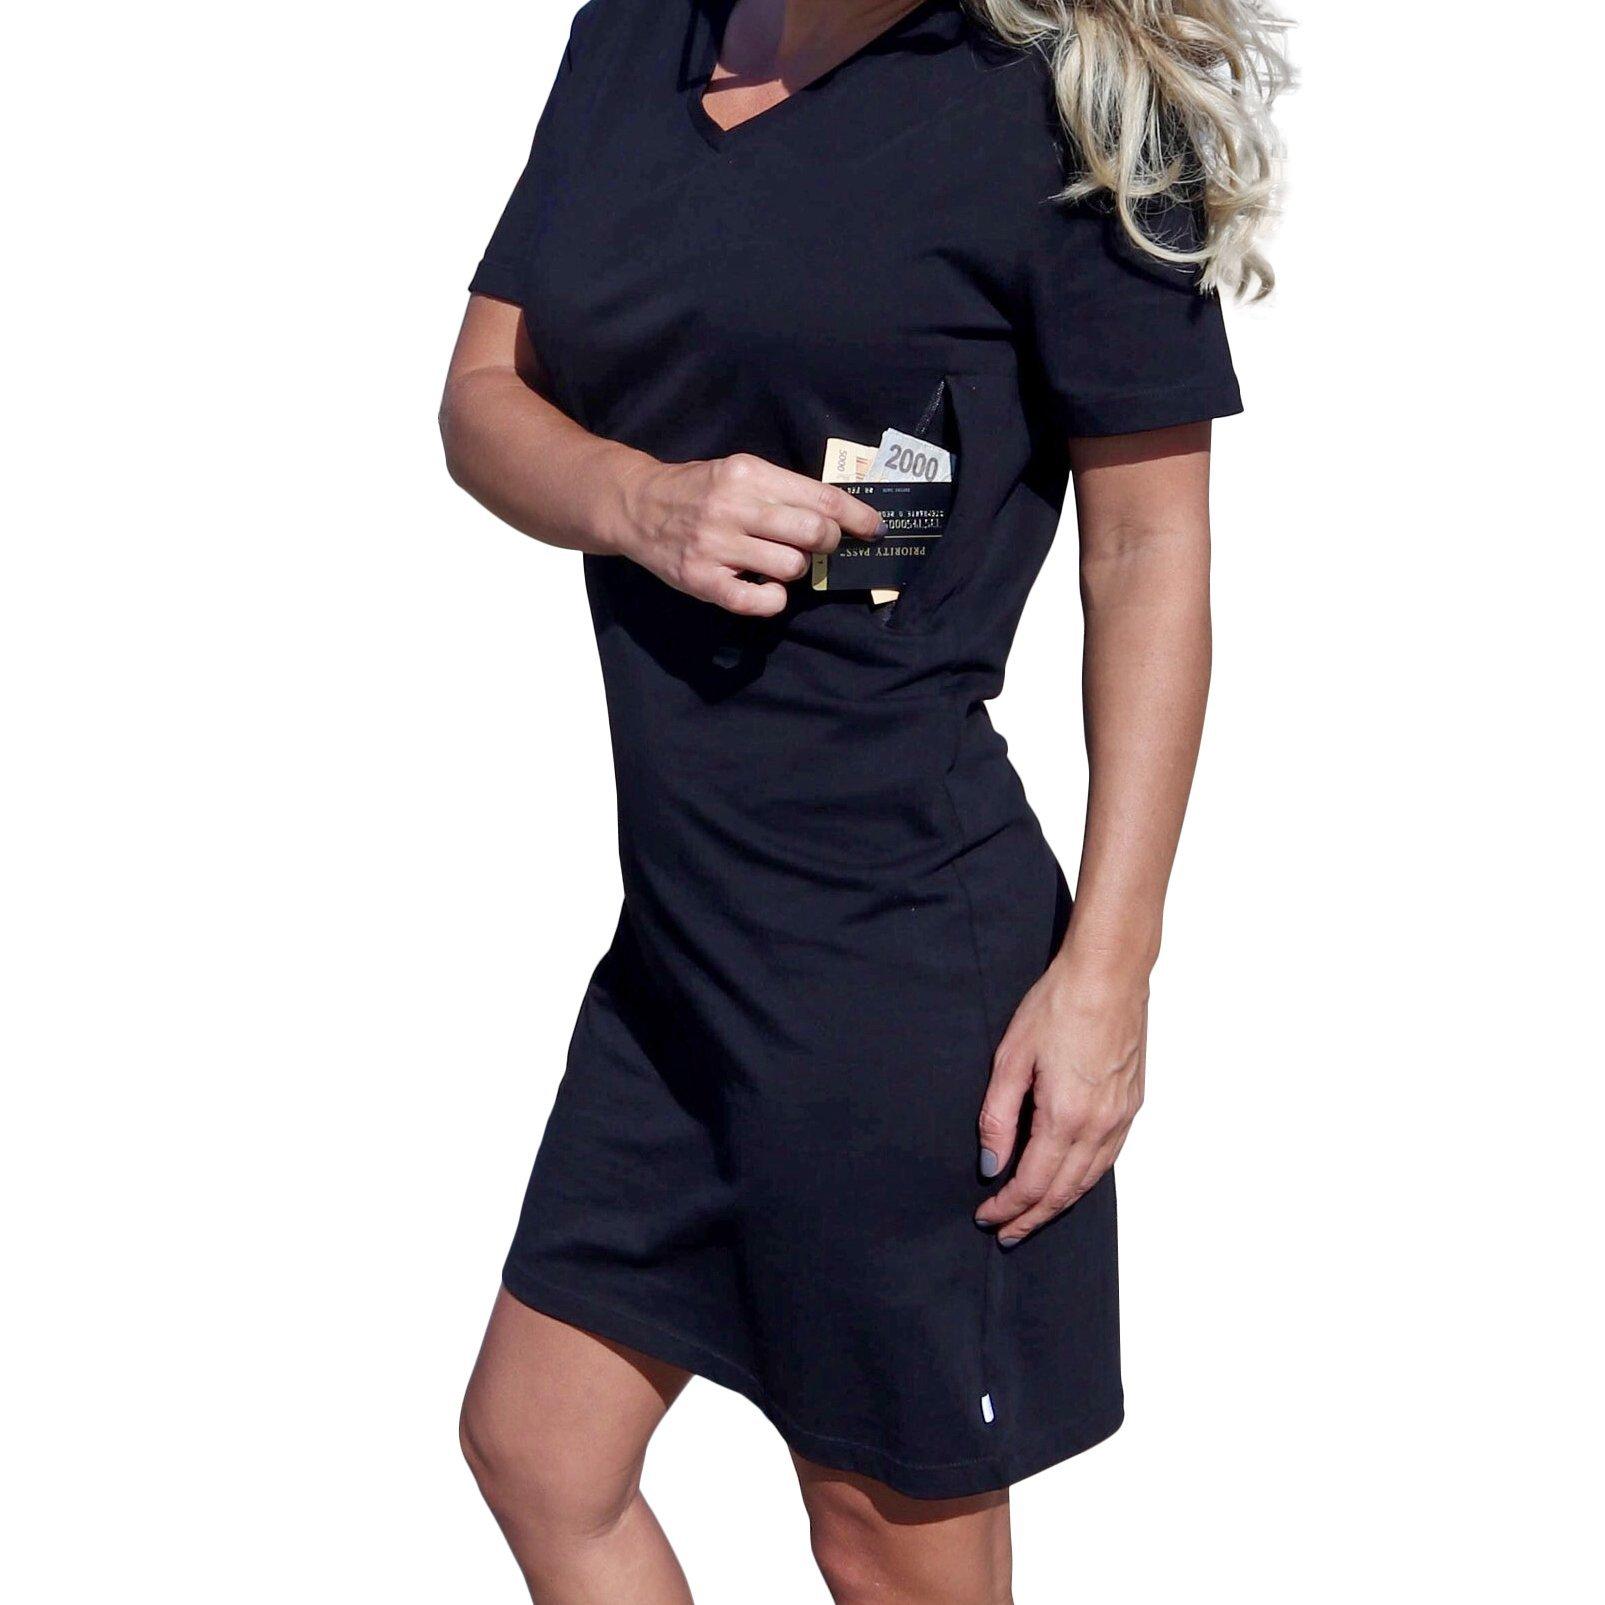 Clever Travel Companion Pickpocket Proof T-Shirt Dress With 2 Hidden Zipper Pockets (Medium, Black)